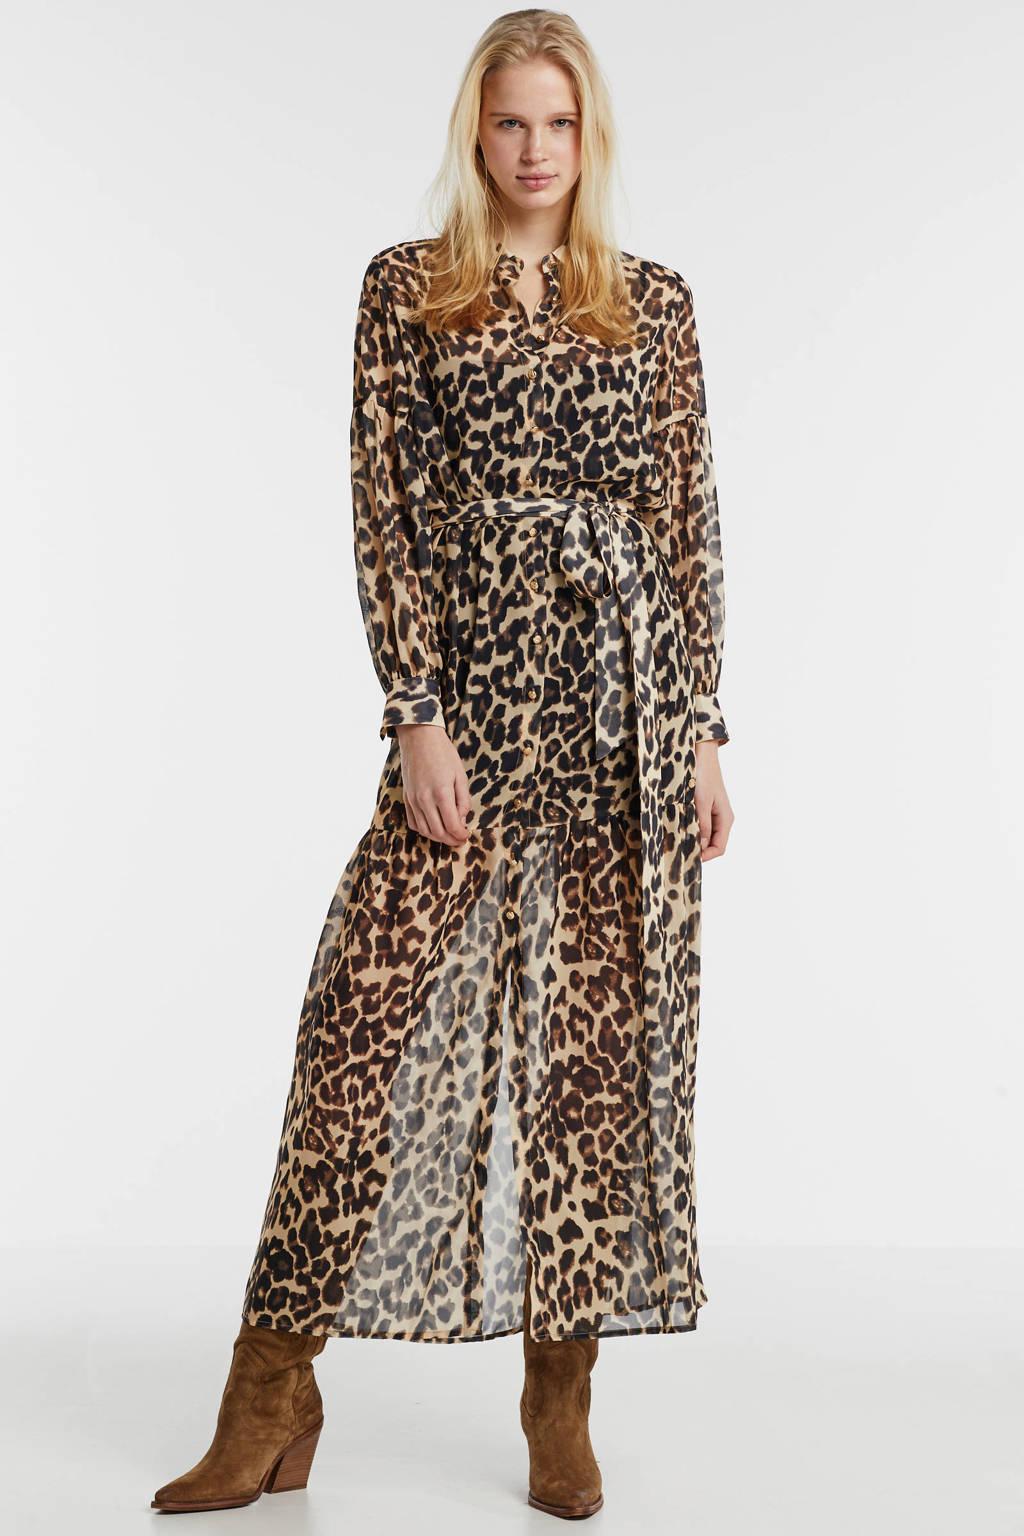 JOSH V maxi jurk ROSEMARY met panterprint lichtbruin/ zwart, Lichtbruin/ zwart